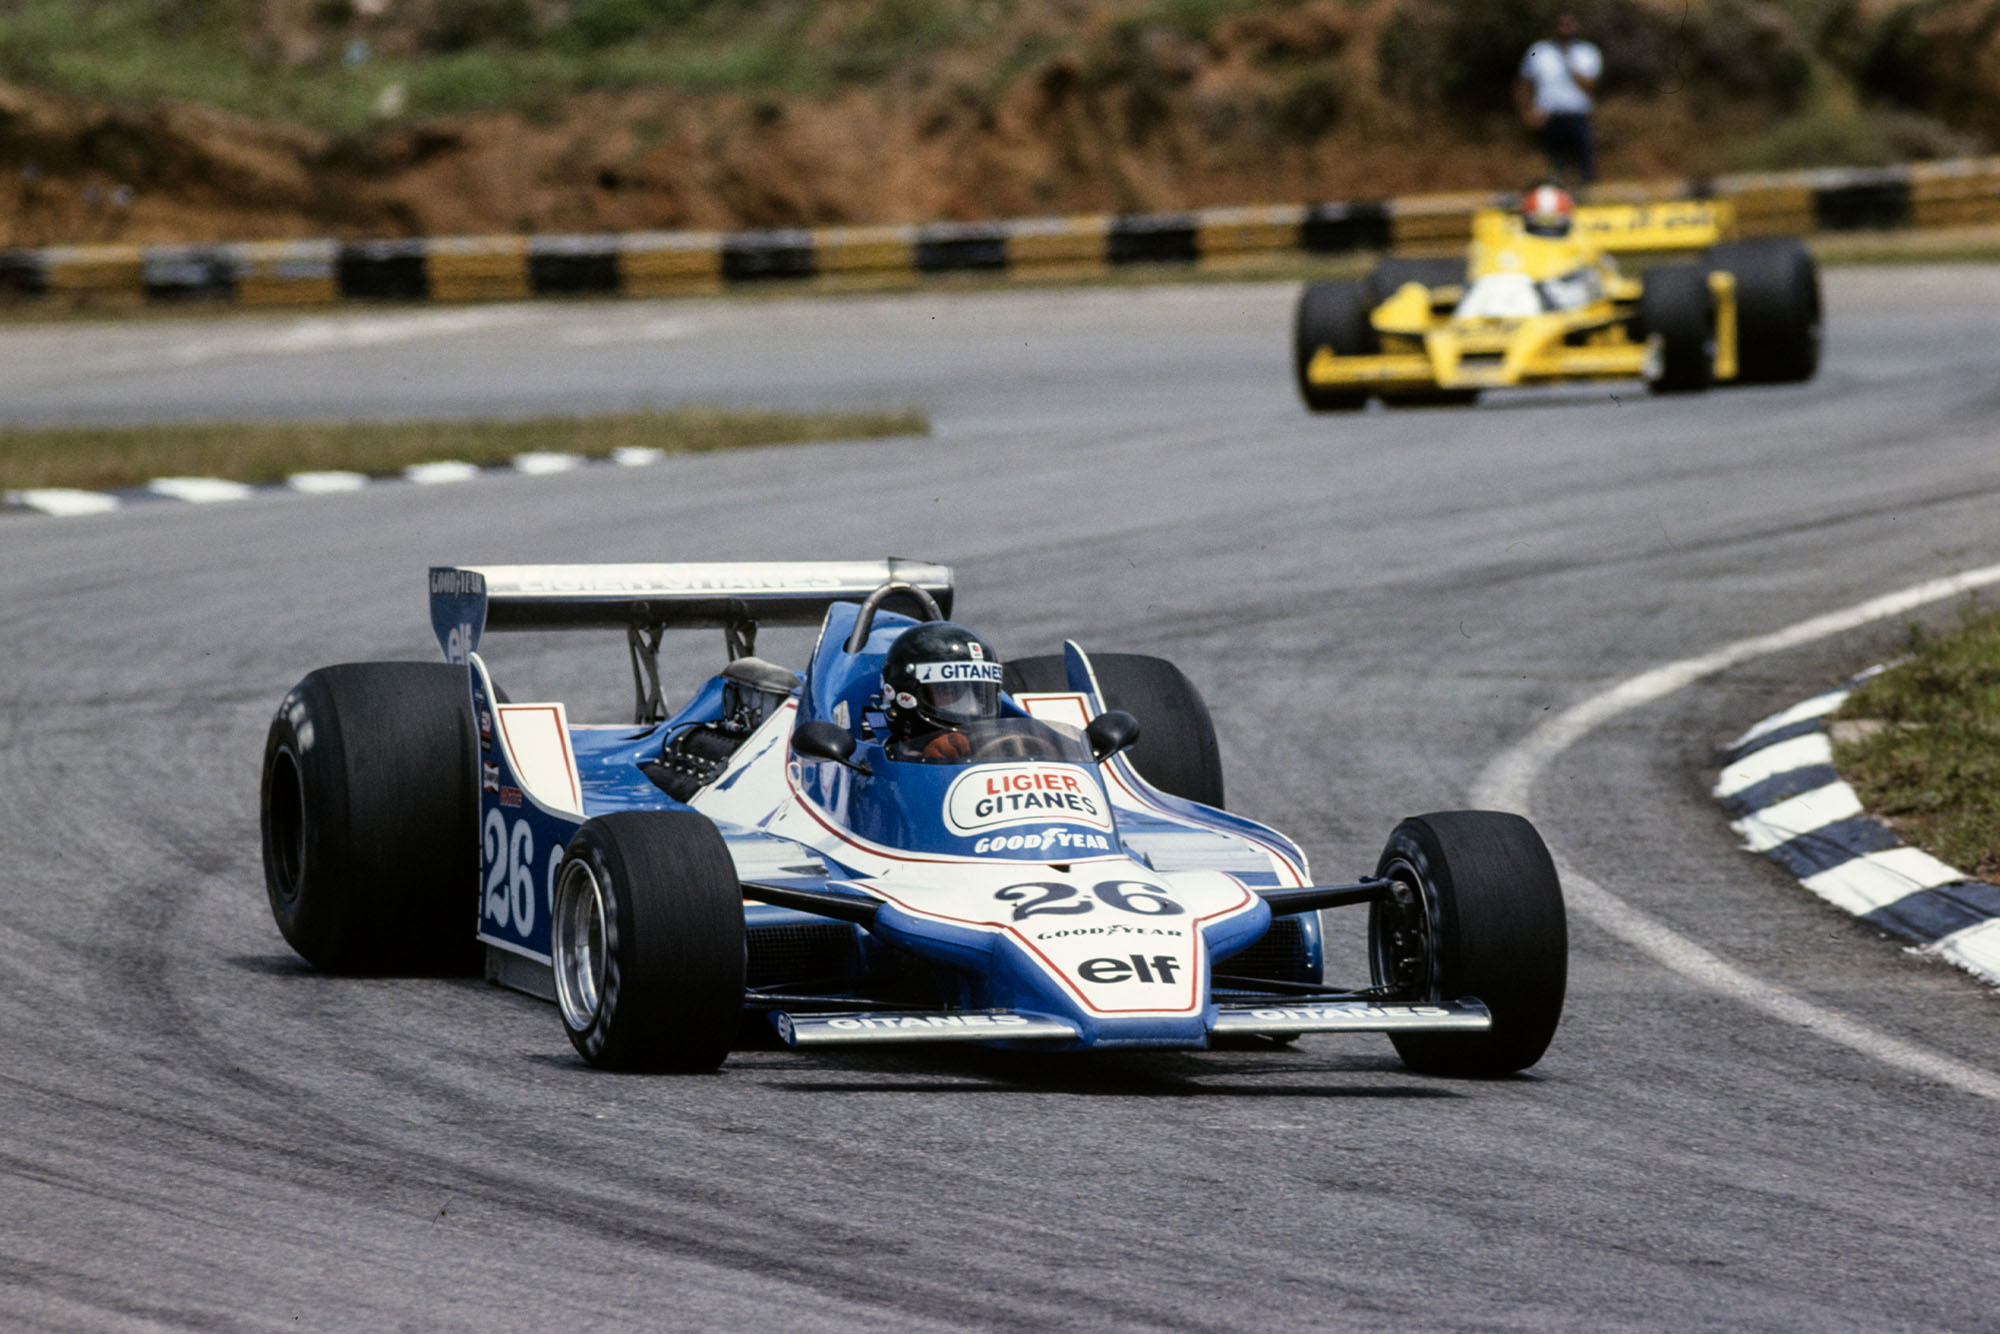 Jacques Laffite (Ligier) competing at the 1979 Brazilian Grand Prix, Interlagos.